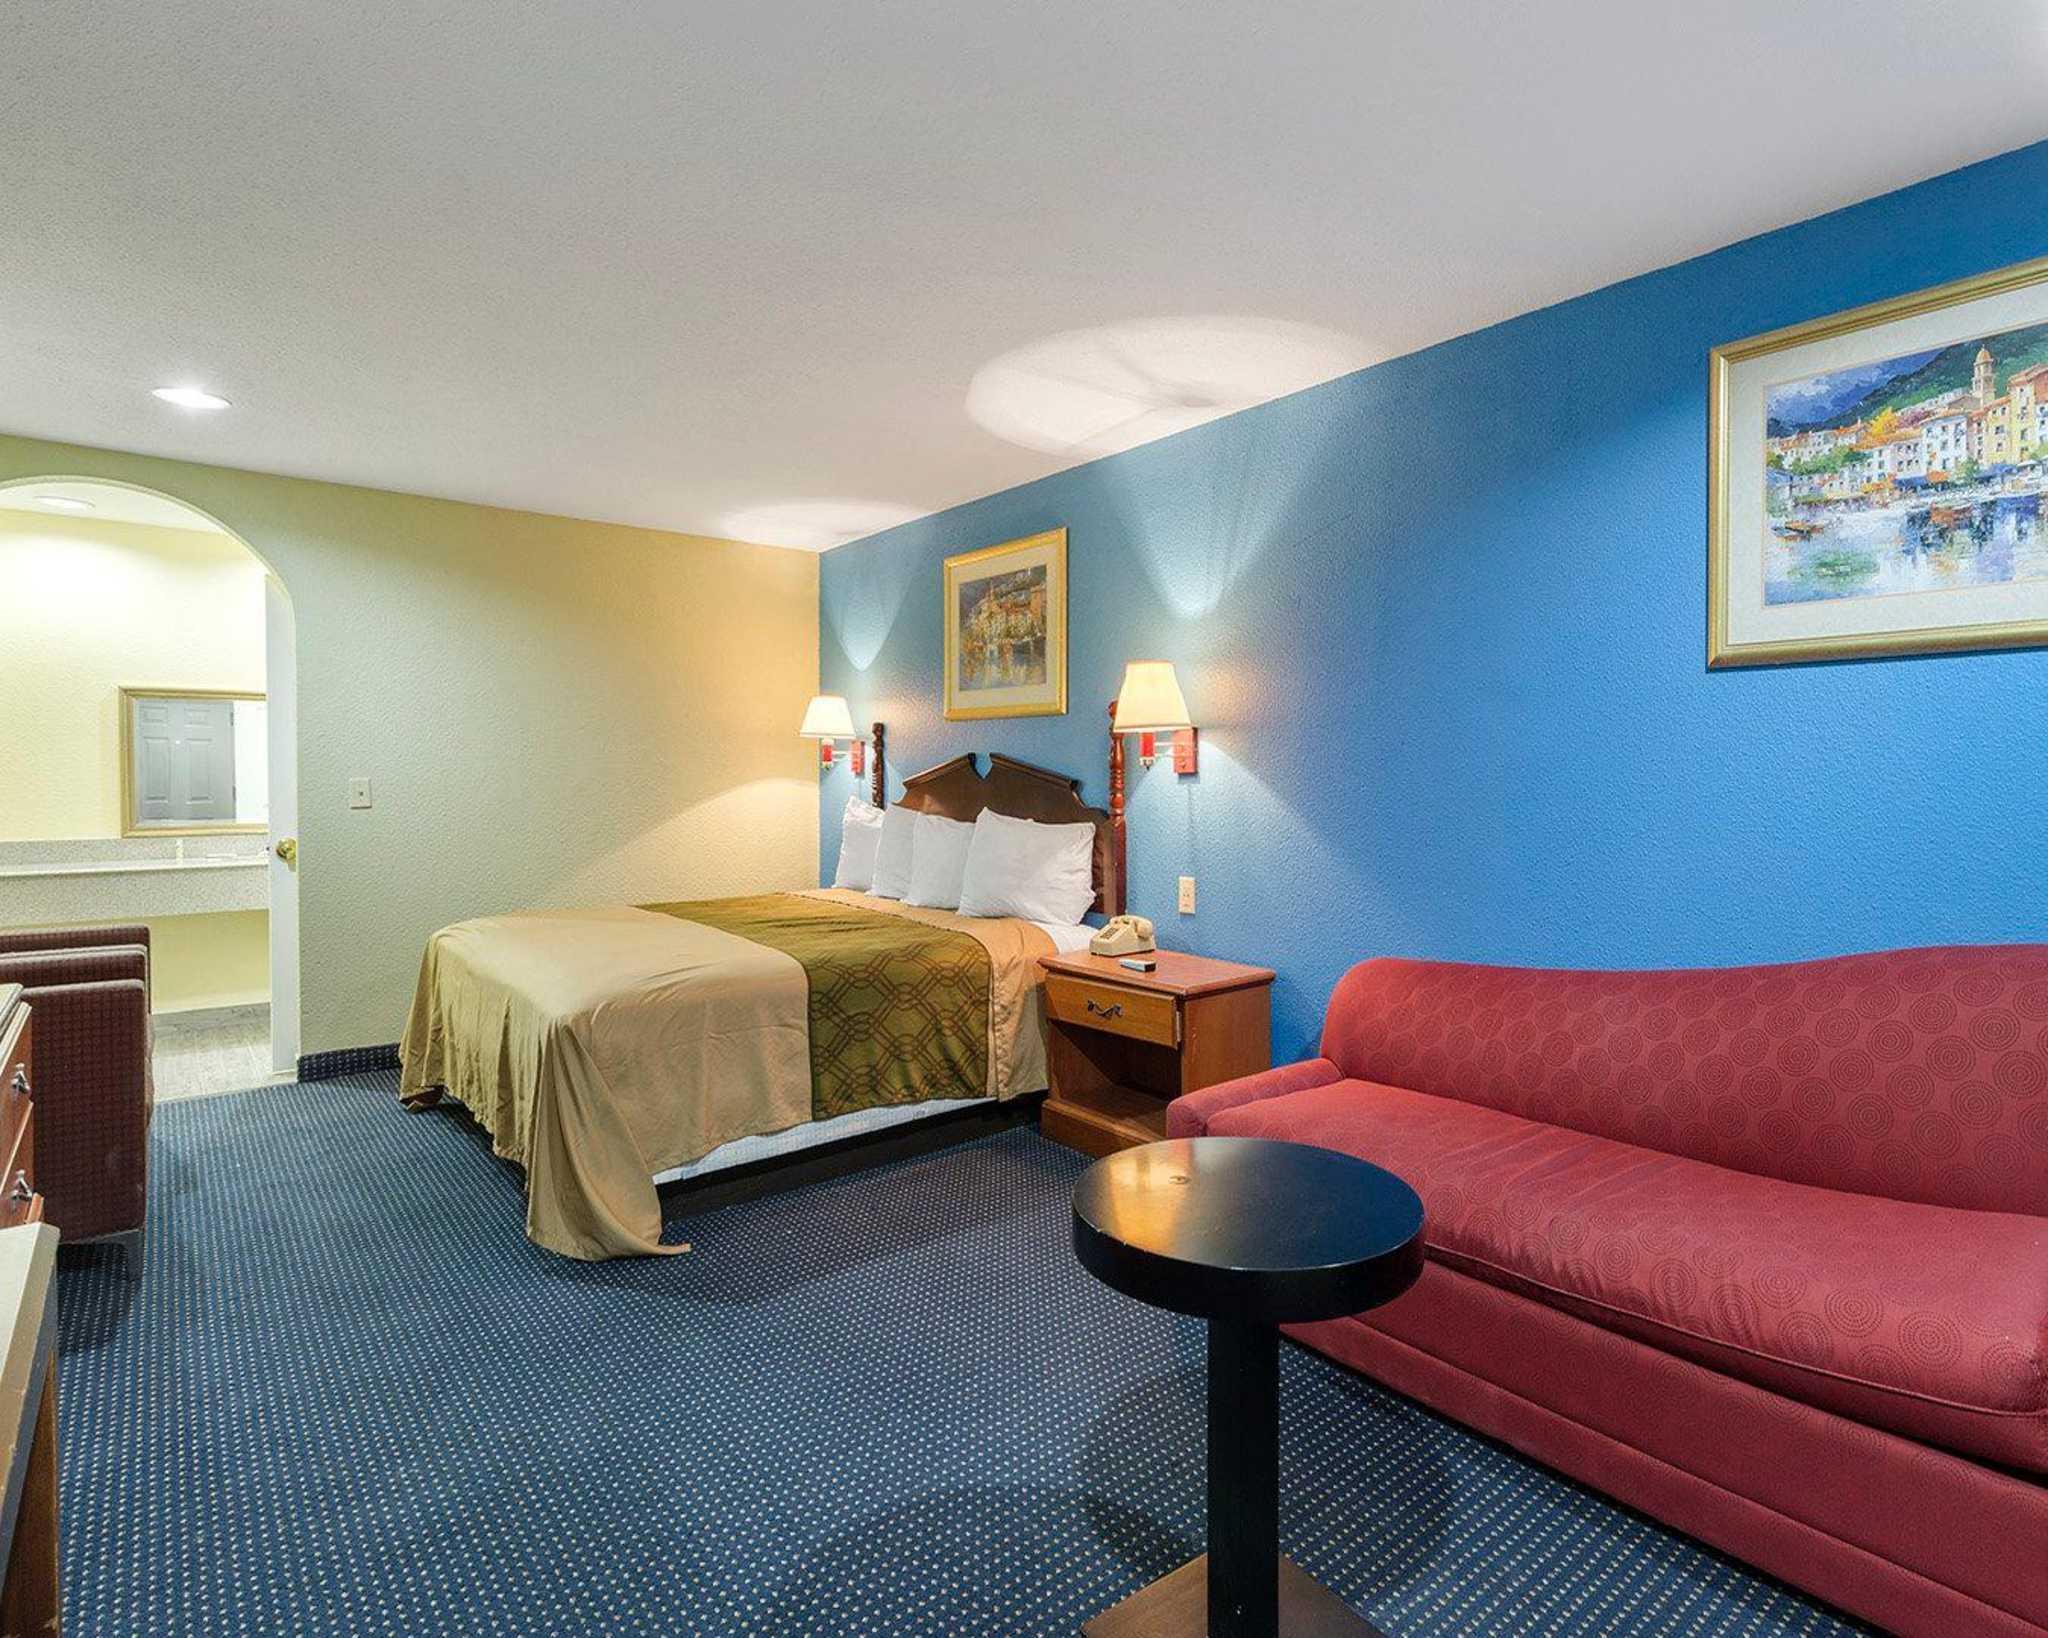 Rodeway Inn image 23